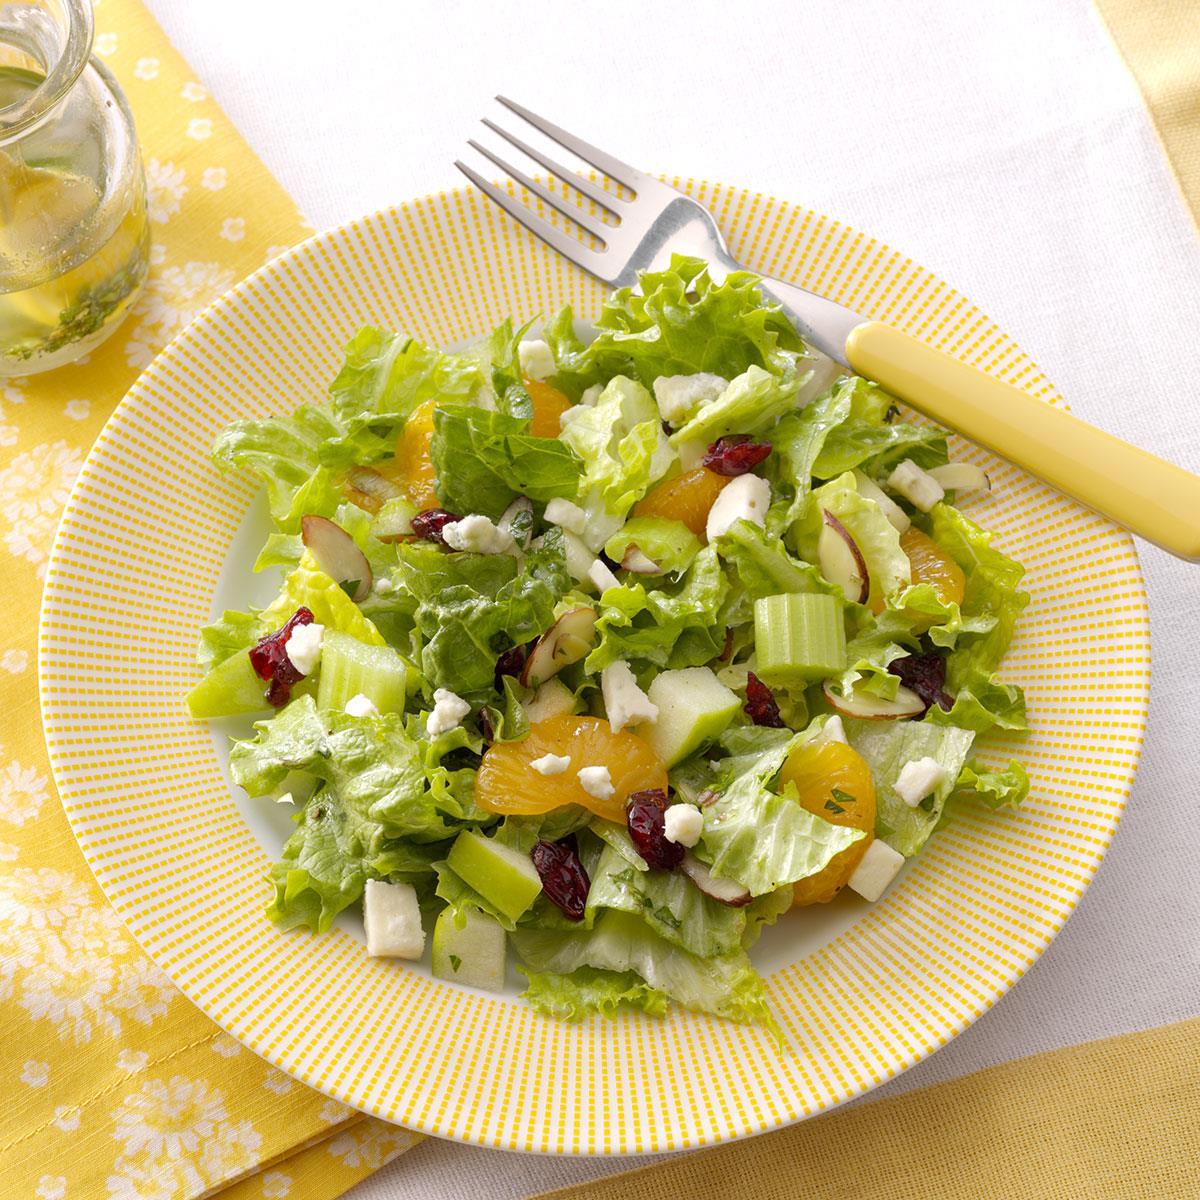 Cornucopia Salad image